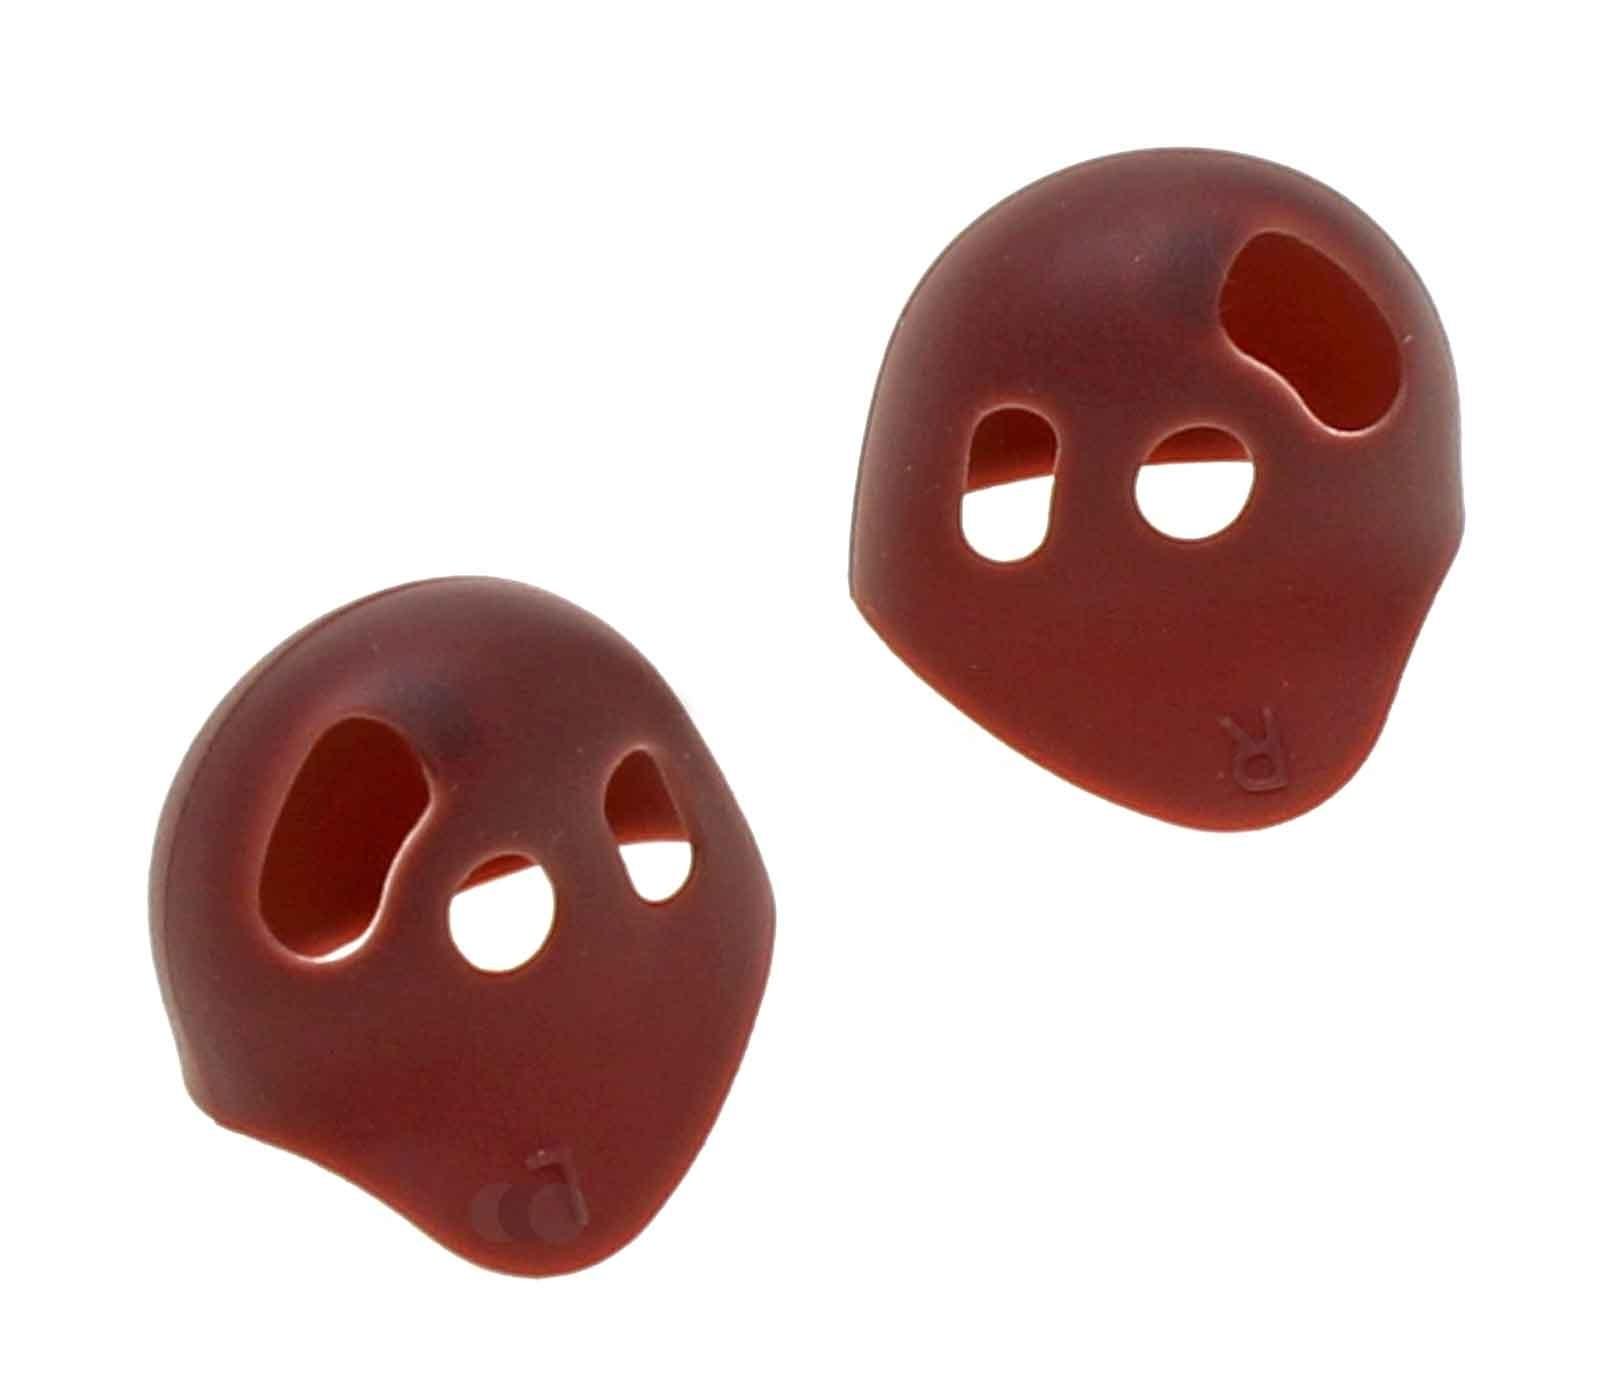 Original Ohrpolster Ohrstöpsel Rubber Tips für Samsung SM-R180 Galaxy Buds Live In-ear Kopfhörer, Bronze, GH81-19550C